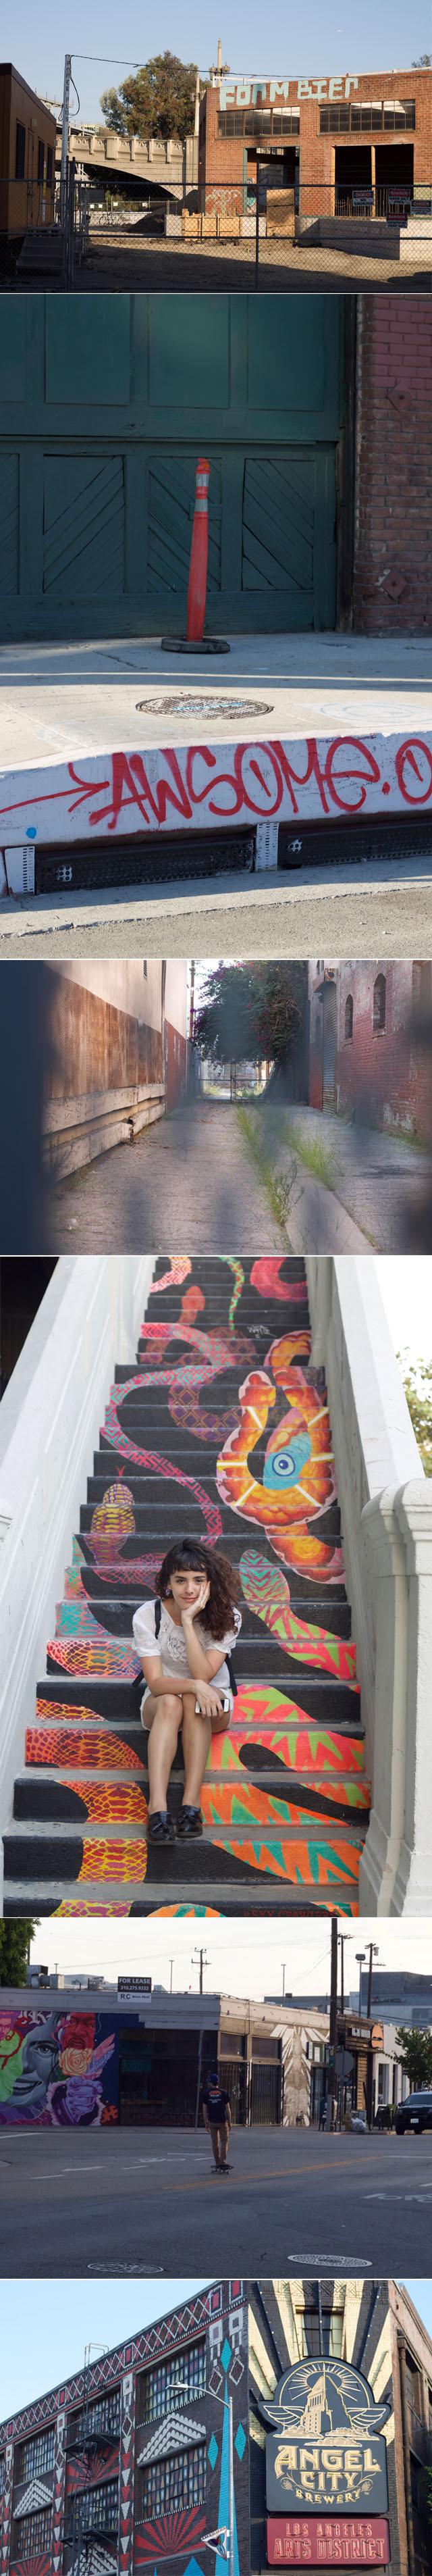 arts-disrict2